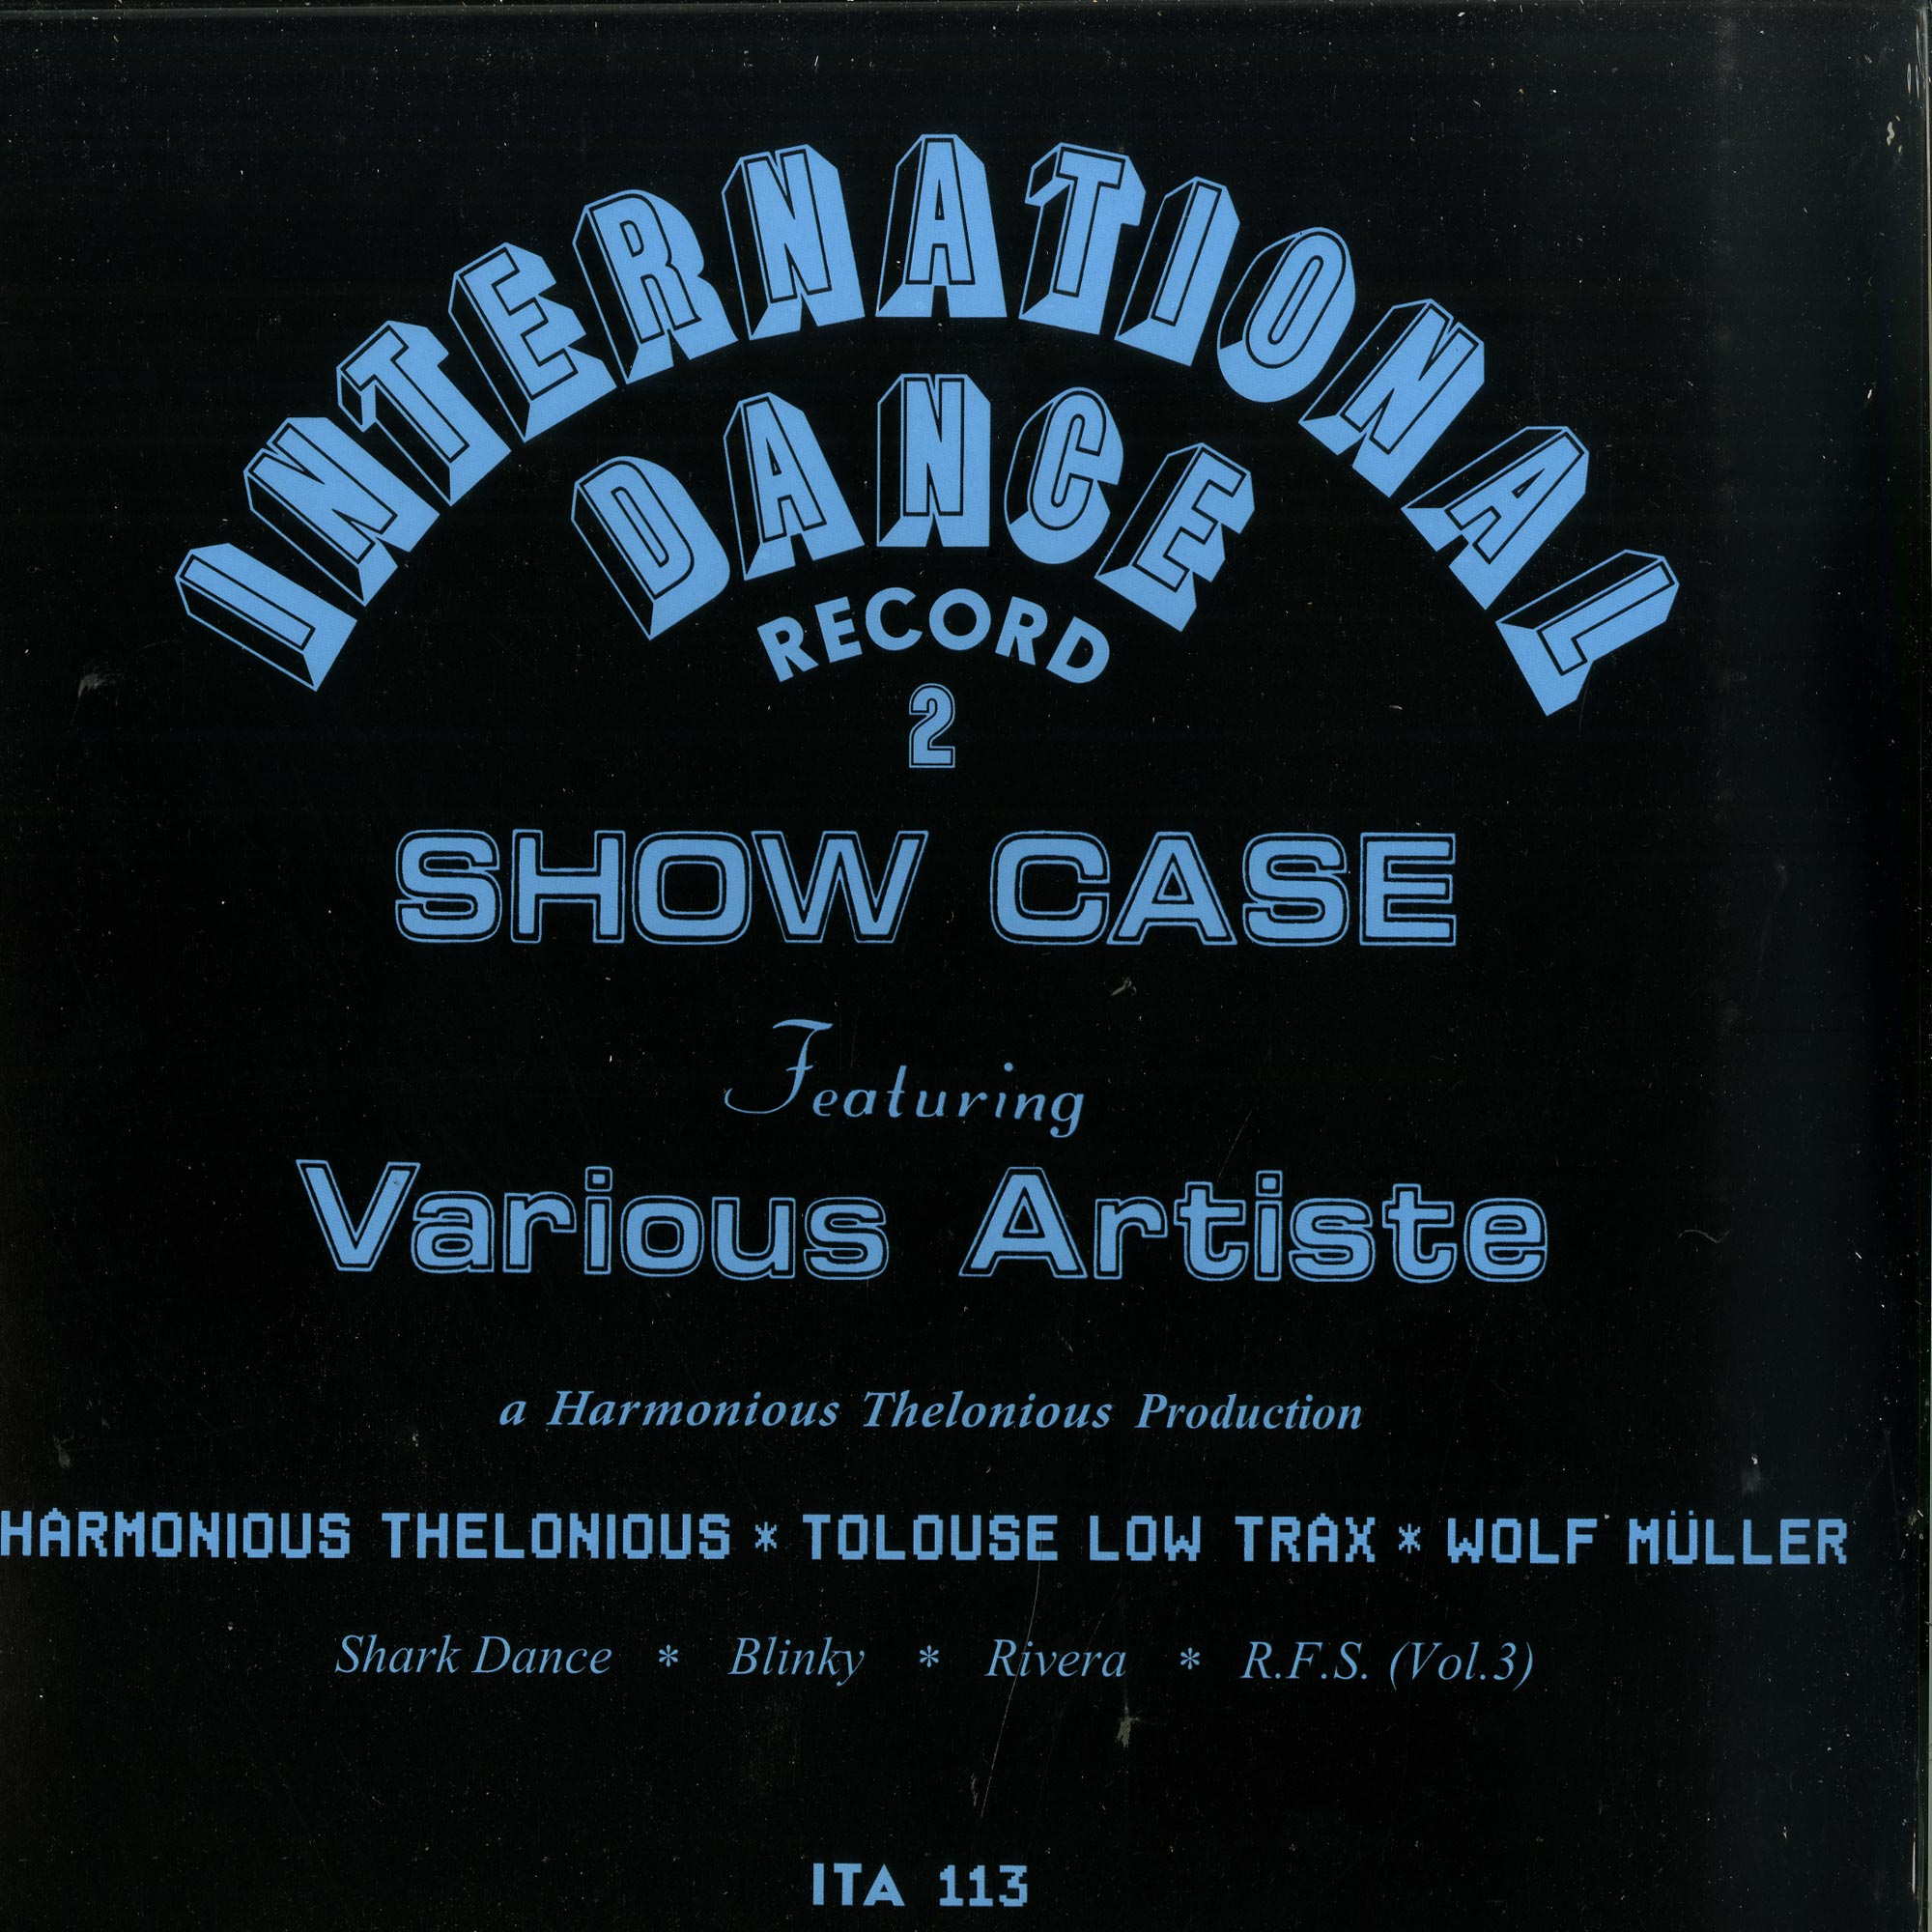 Harmonious Thelonious - INTERNATIONAL DANCE RECORD 2